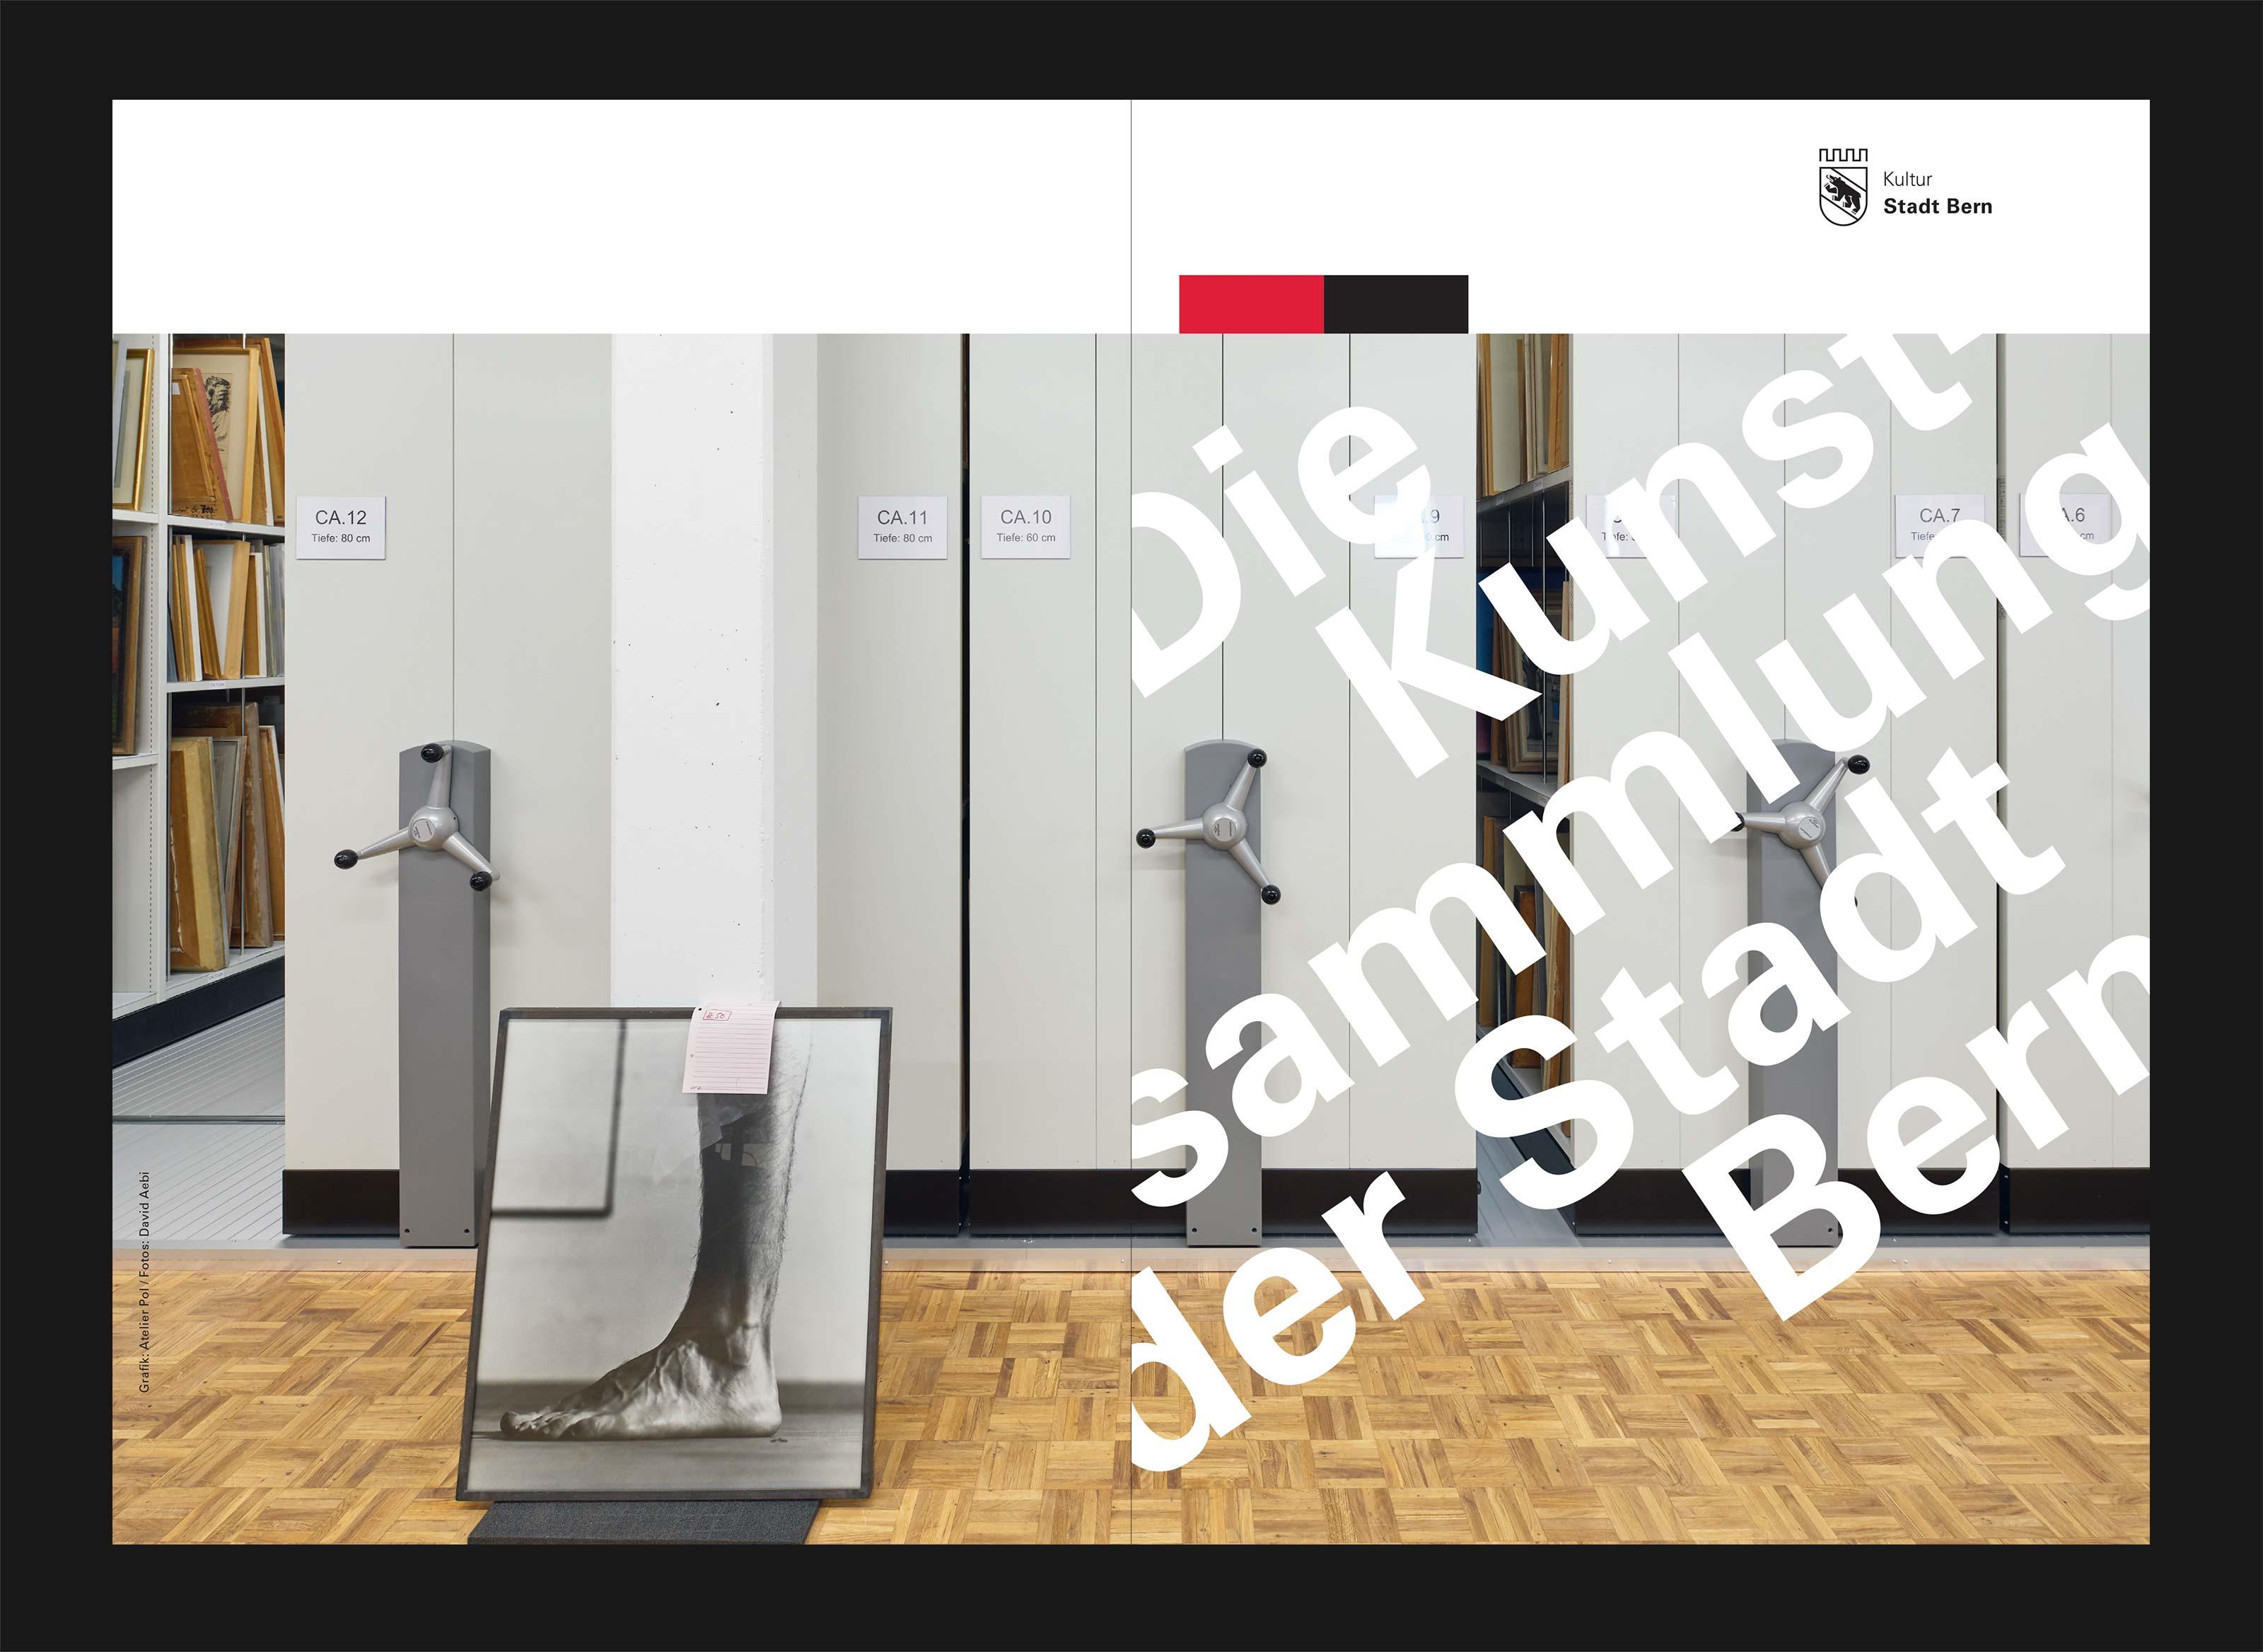 atelier pol, kultur stadt bern, kunstsammlung bern, david aebi, art, graphic design, print, switzerland